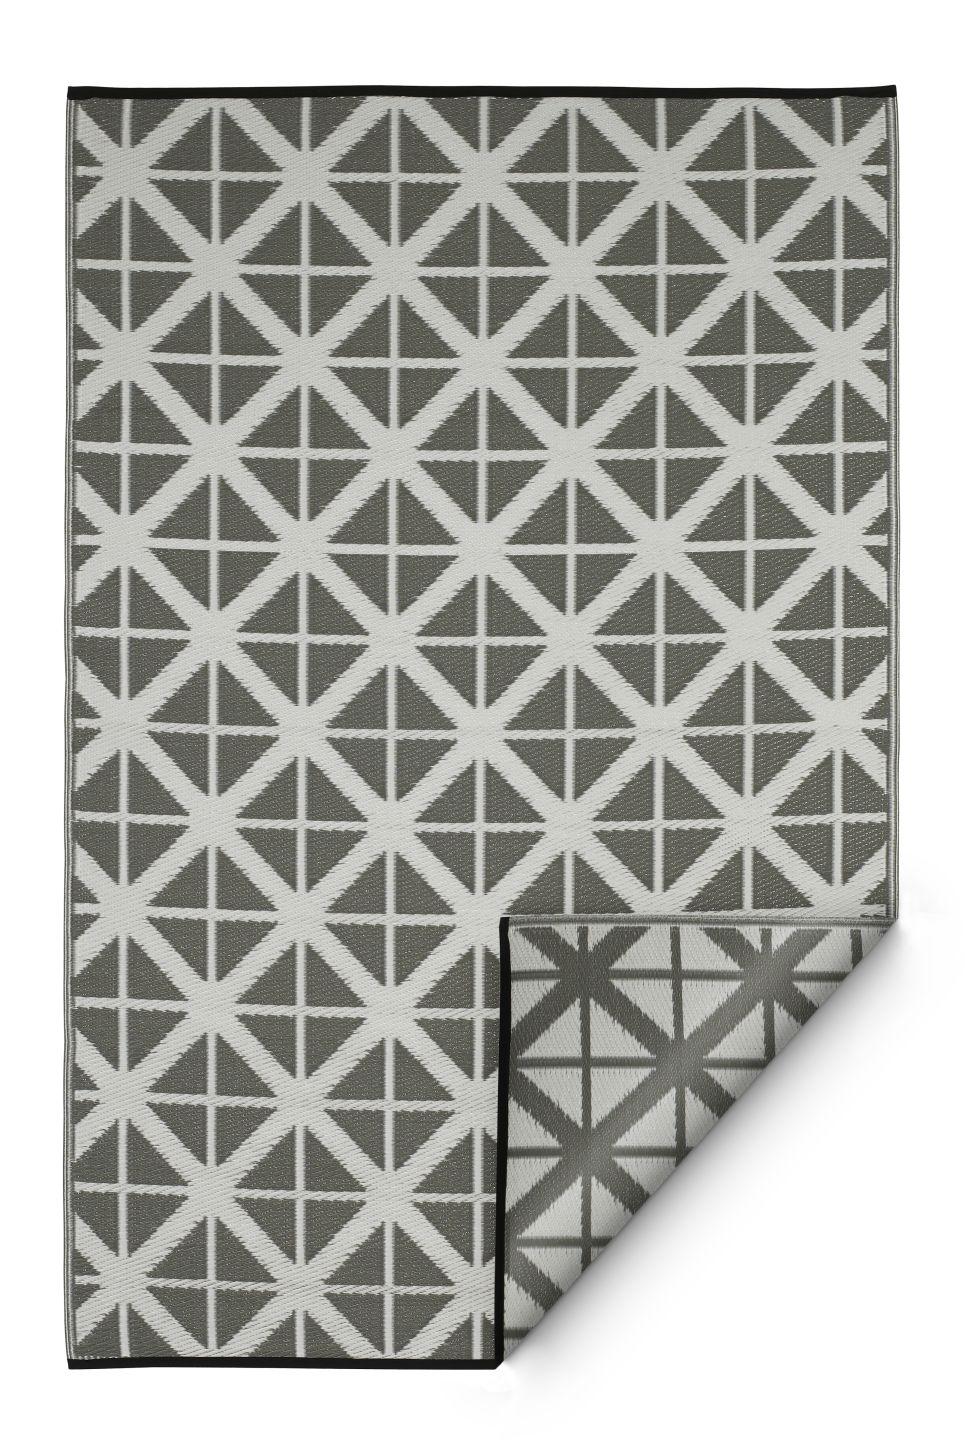 garten im quadrat outdoor teppich manchester grau weiss With garten planen mit balkon teppich grau